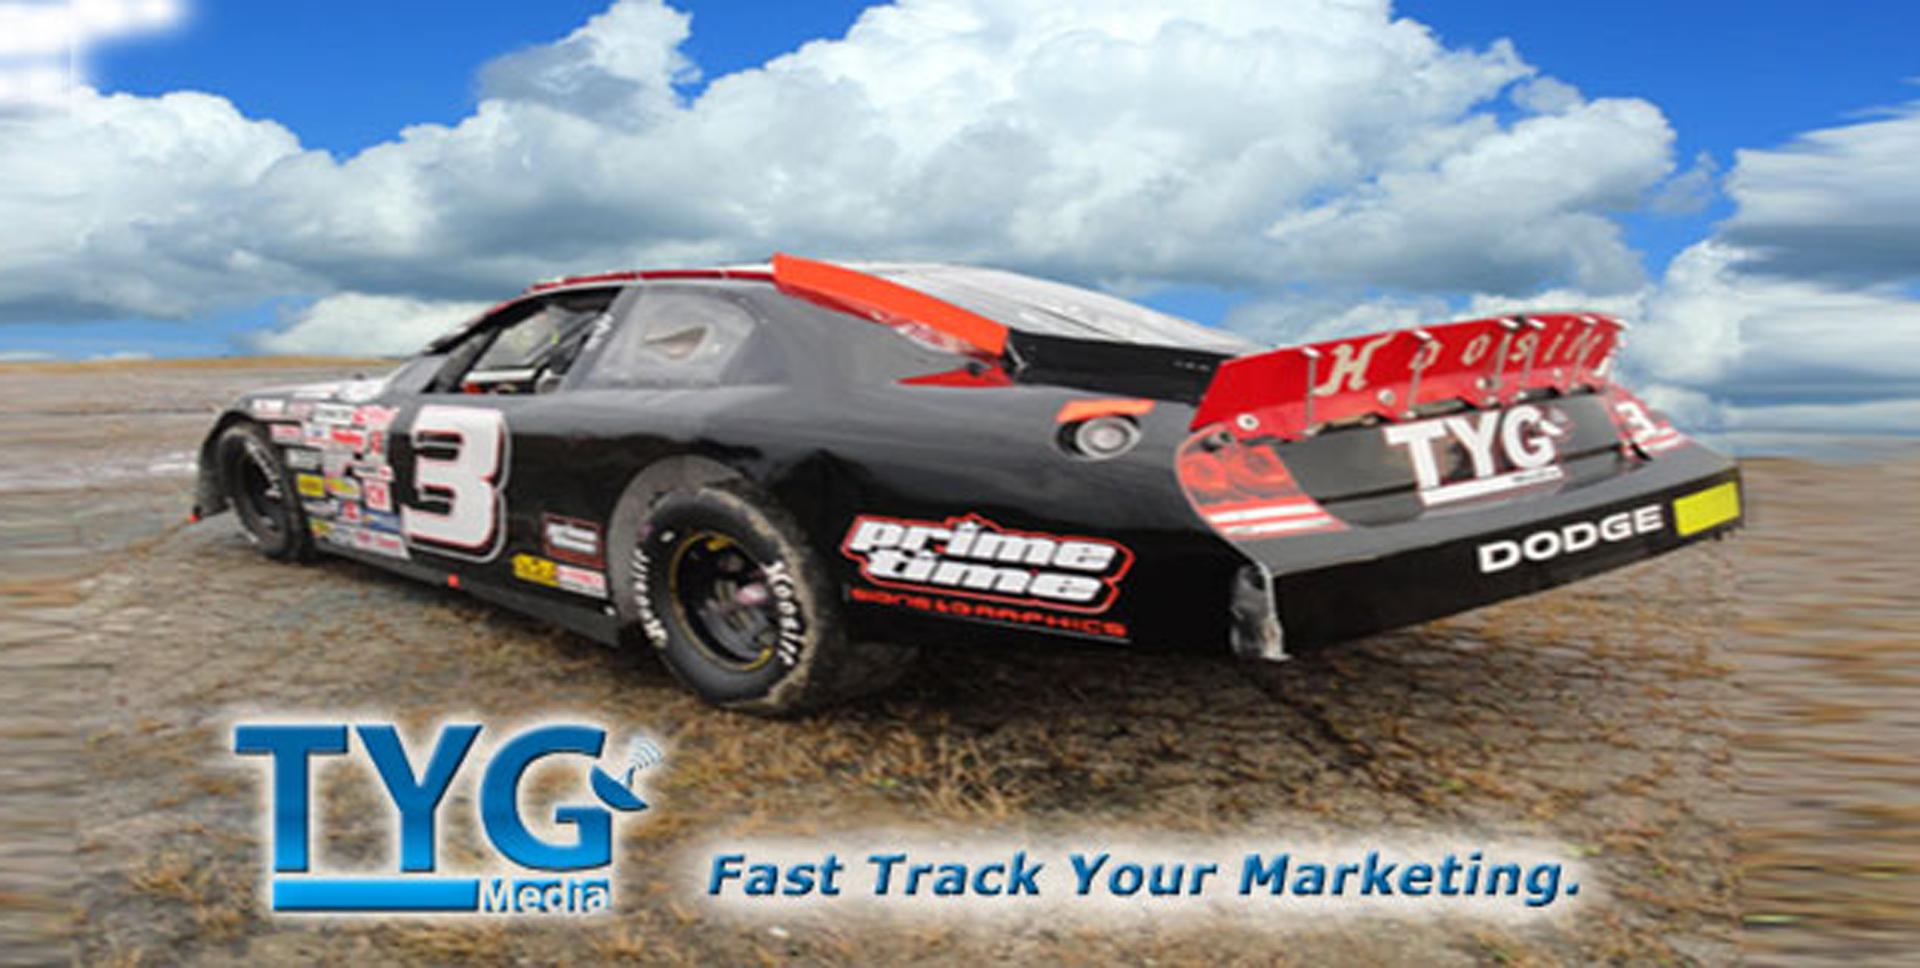 TYG Media - Fast Track